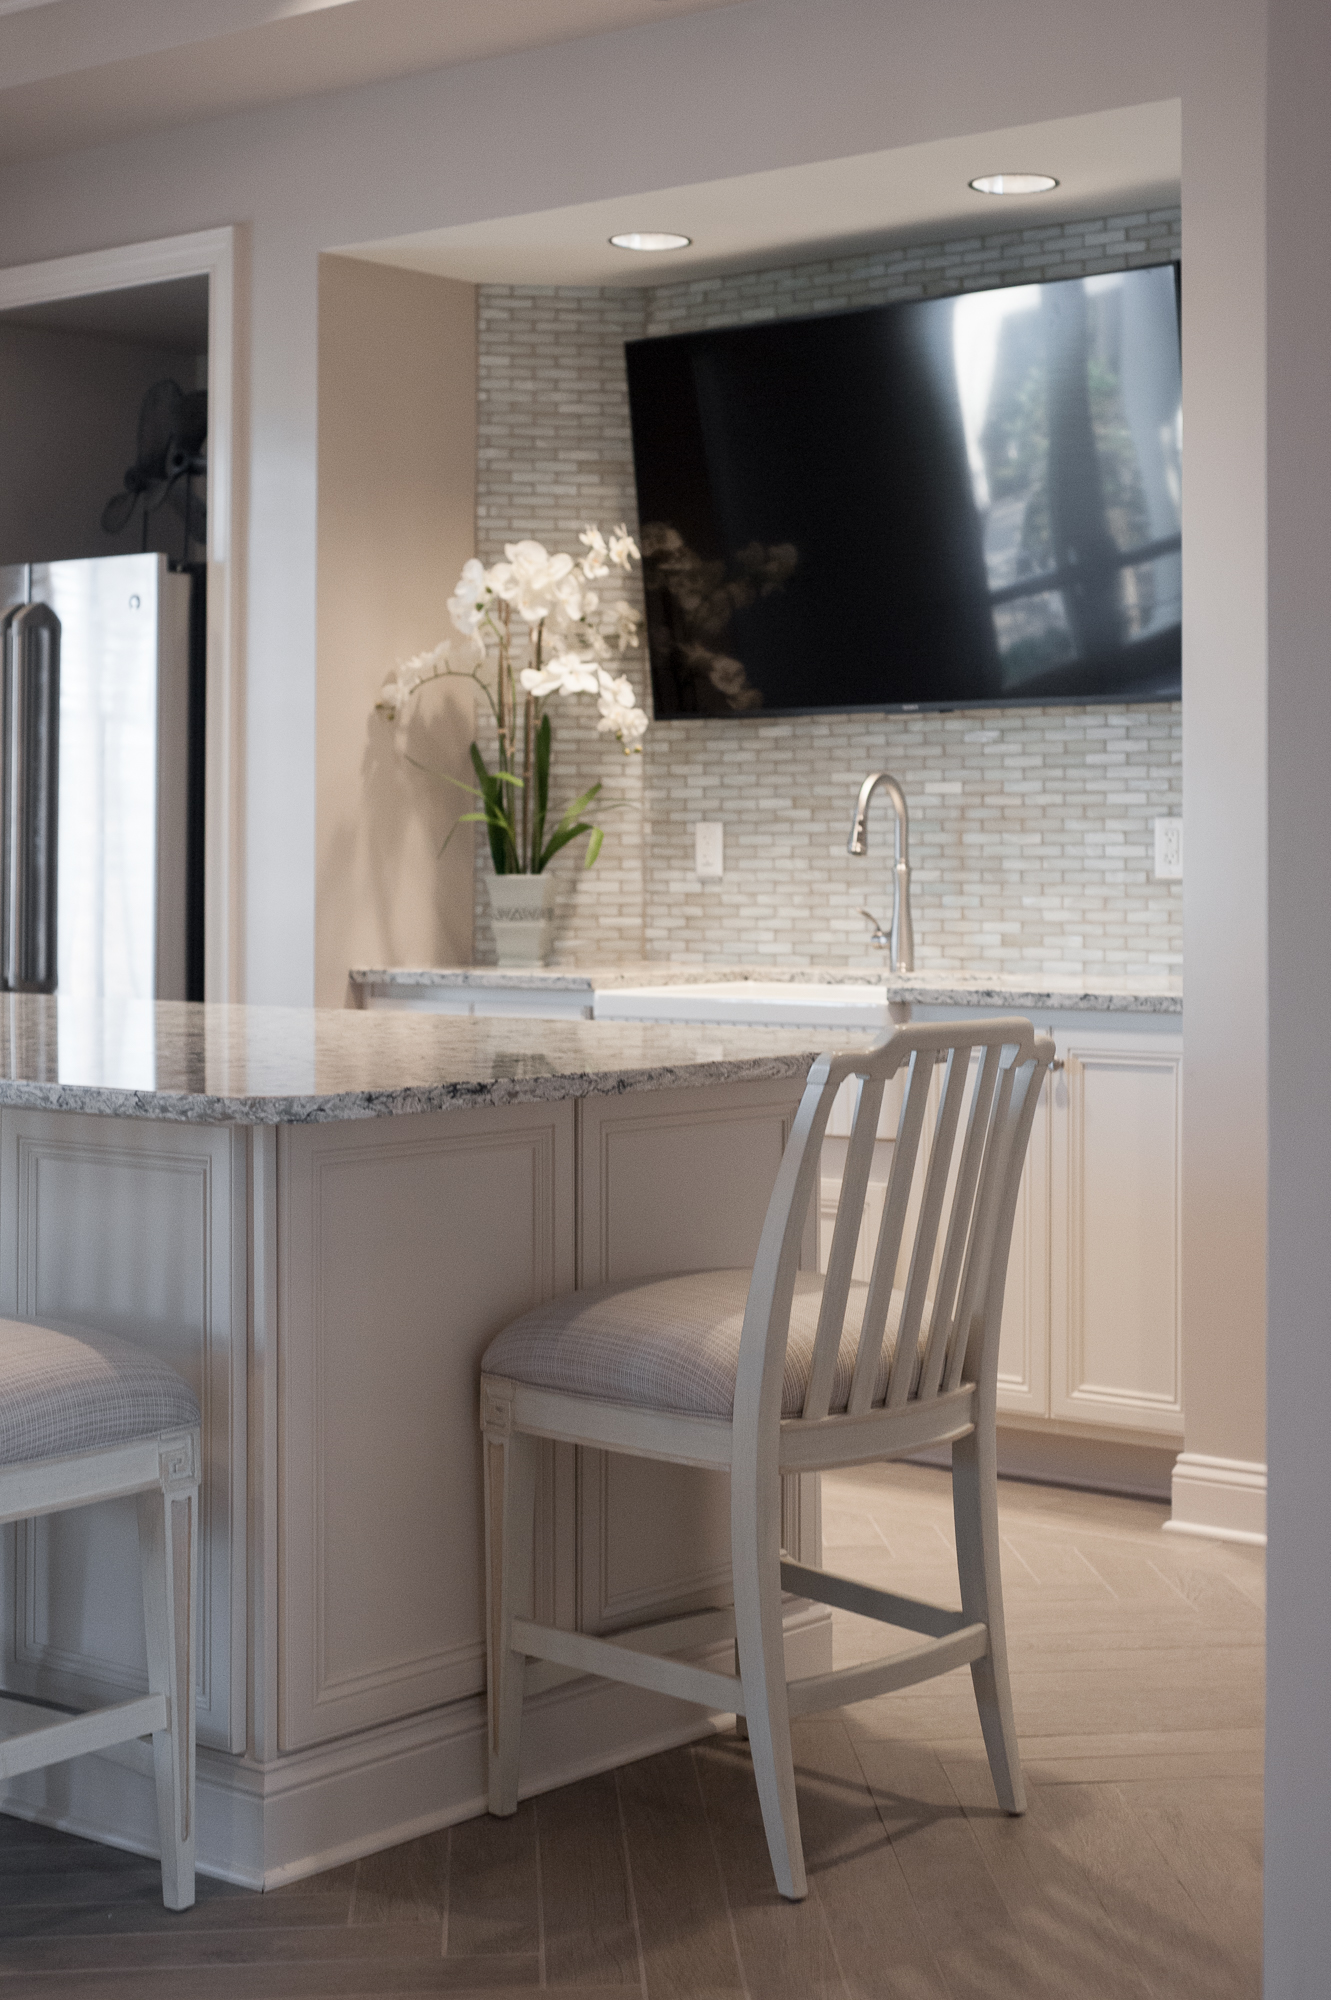 Micamy_Design_Studio_Interior_Design_Markland_StAugustine_Clubhouse_OldFlorida_Coastal_Glass_Mosaic_Tile_Backsplash_Kitchen_Cambria_Kohler_Blue_ (4).jpg